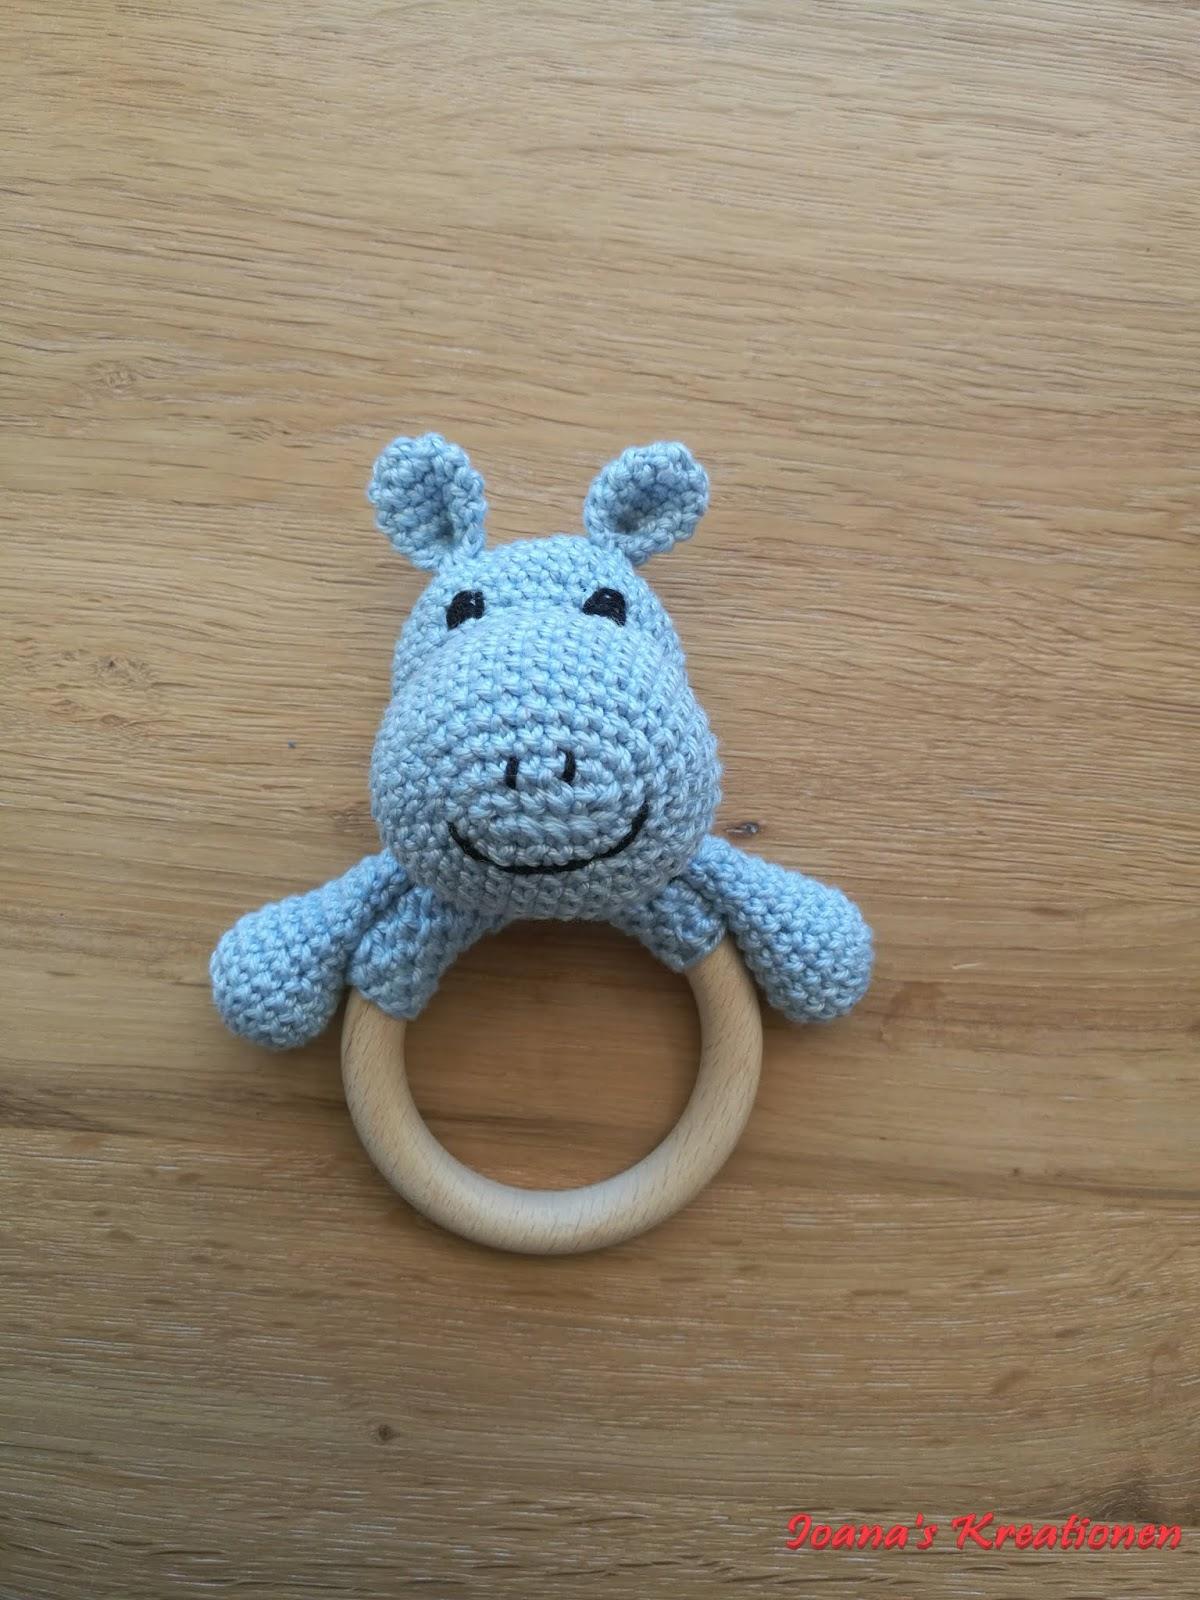 Ravelry: Hady Hippo Amigurumi pattern by Joanne Loh | 1600x1200